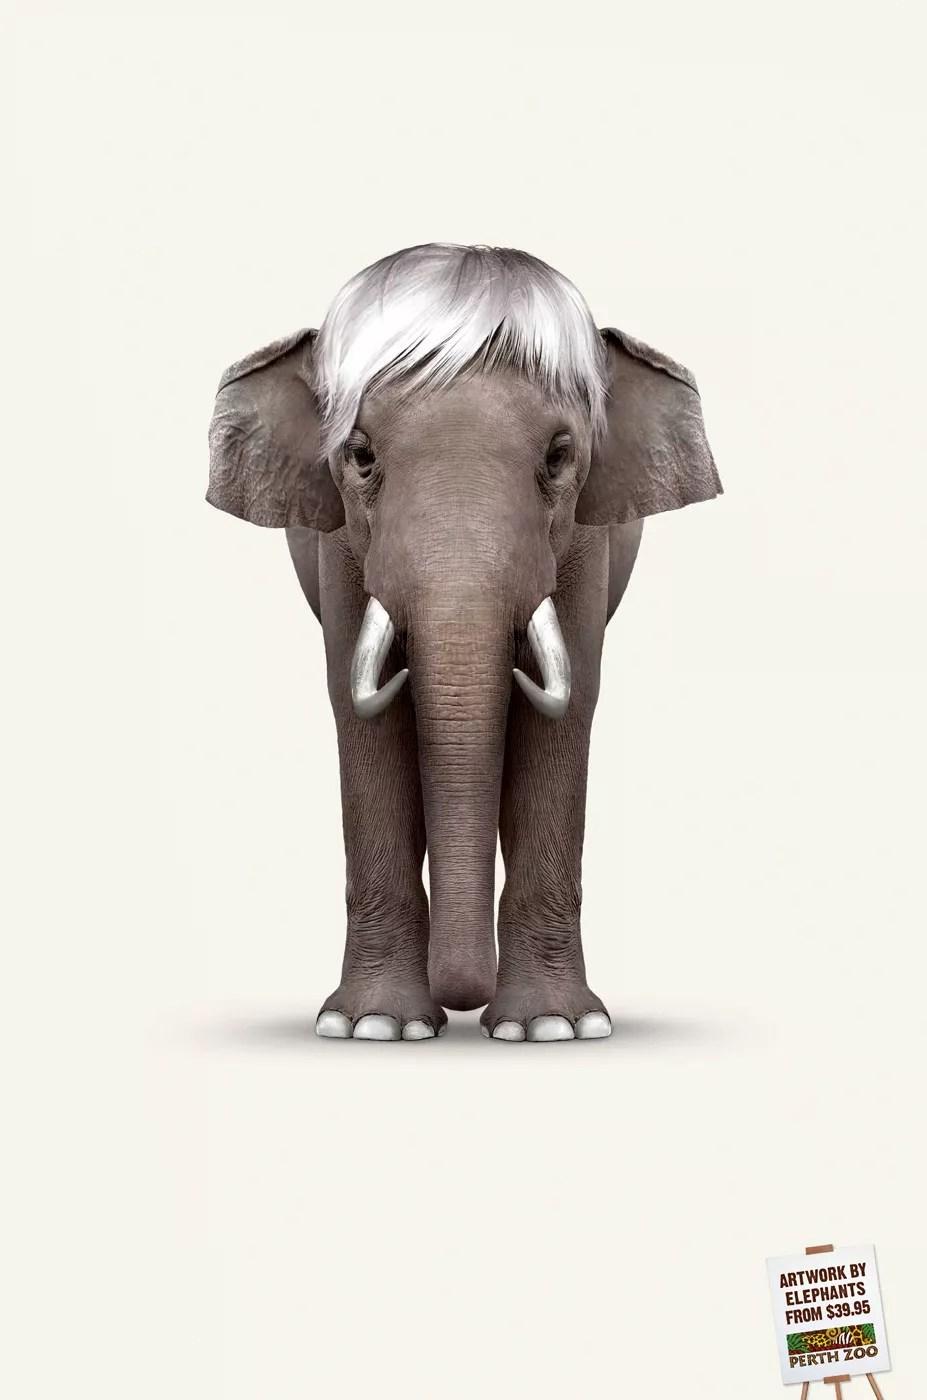 Perth Zoo — Elephant Art: Warhol